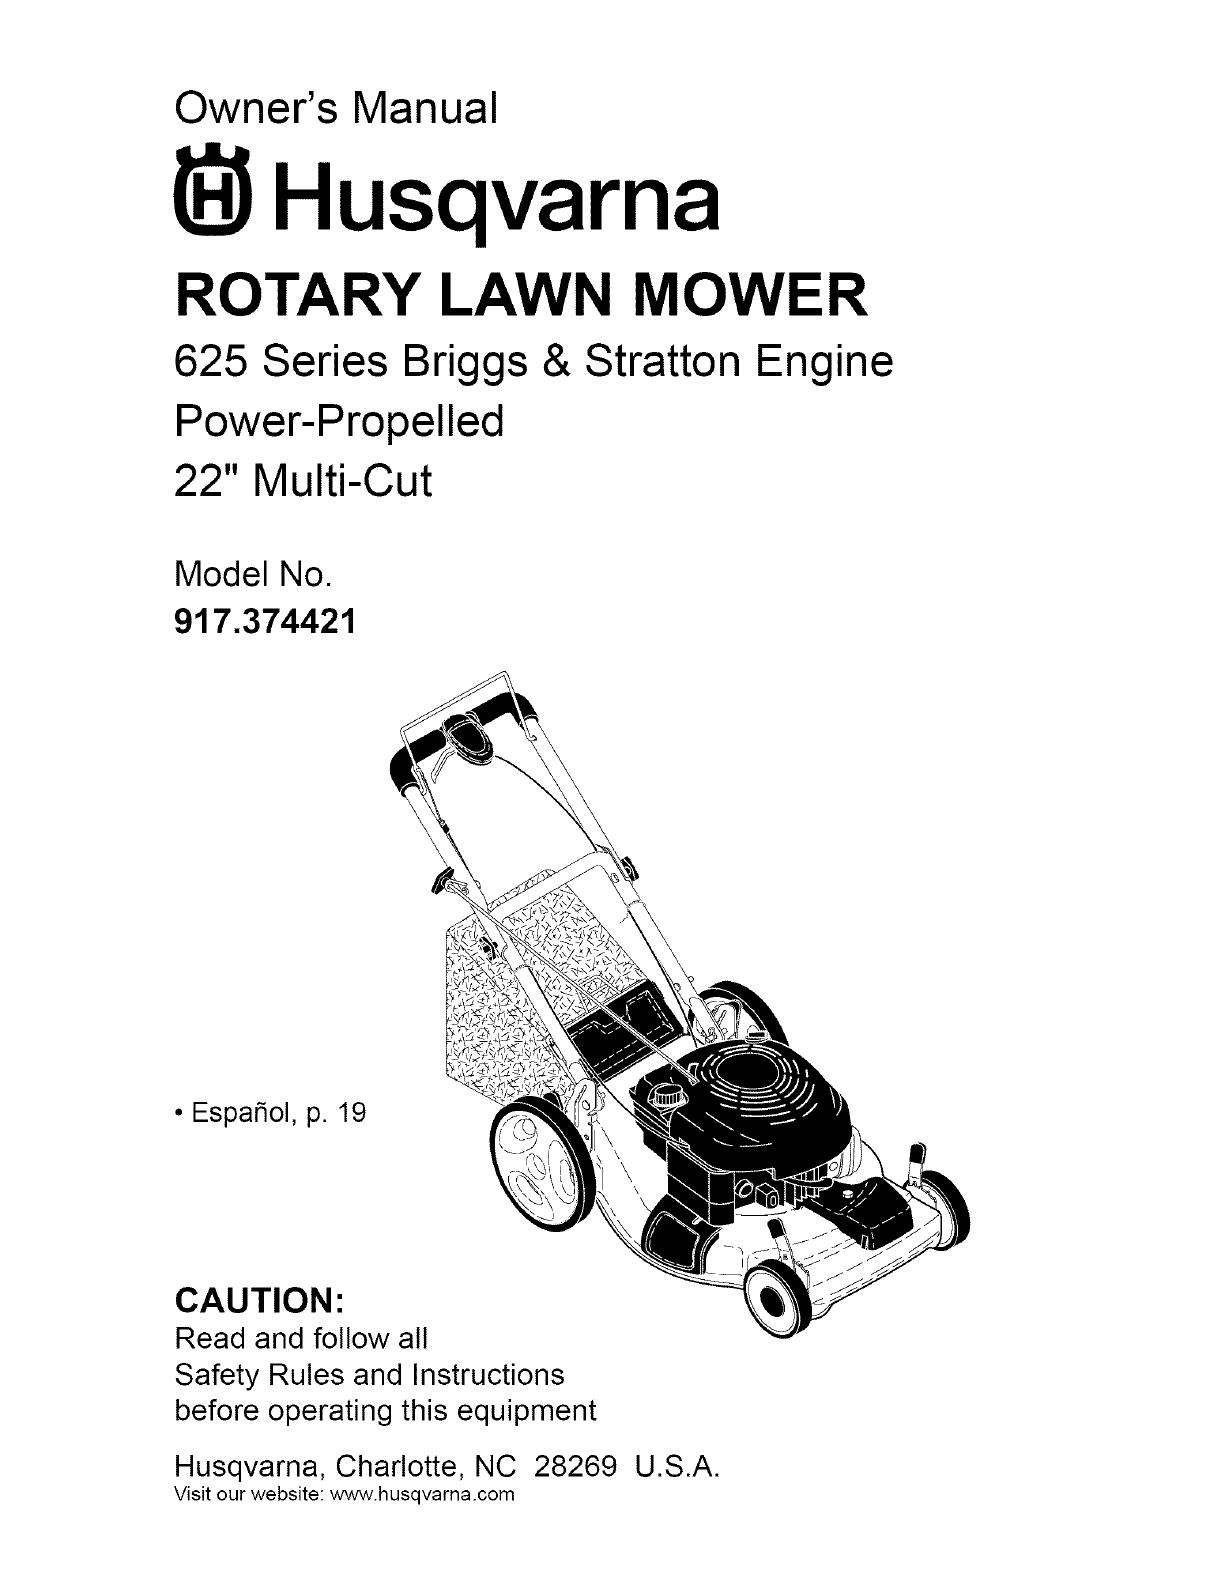 Husqvarna 917374421 User Manual LAWN MOWER Manuals And